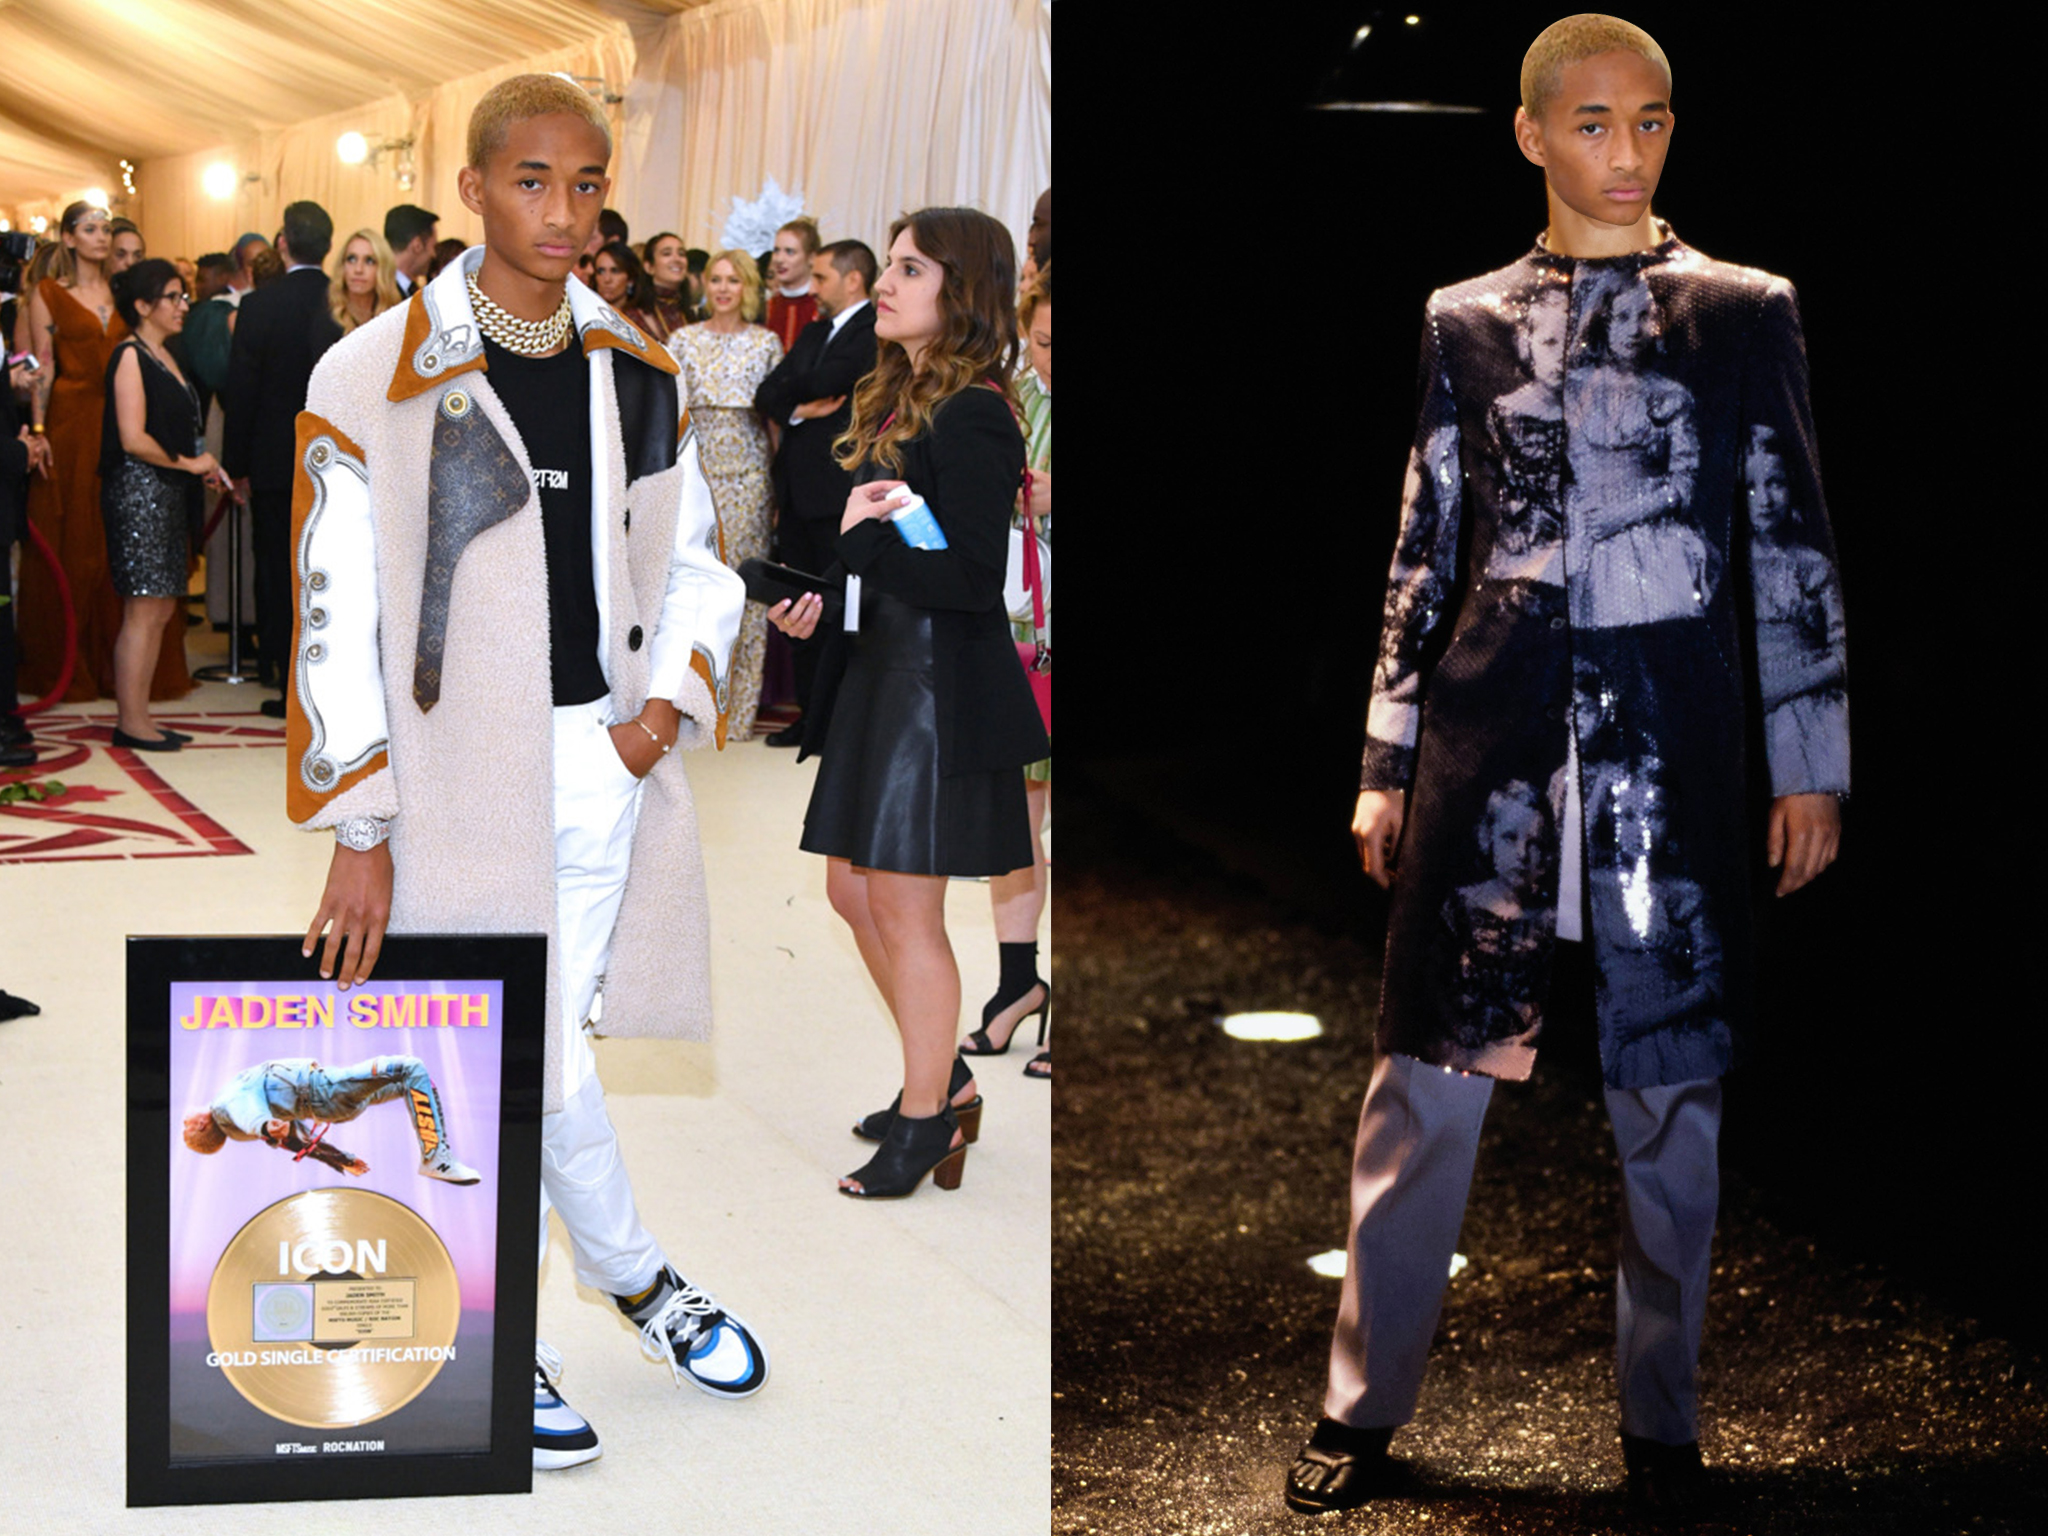 left: Jaden Smith in Louis Vuitton, right (we wish he would wear this instead): Alexander McQueen Fall 1998